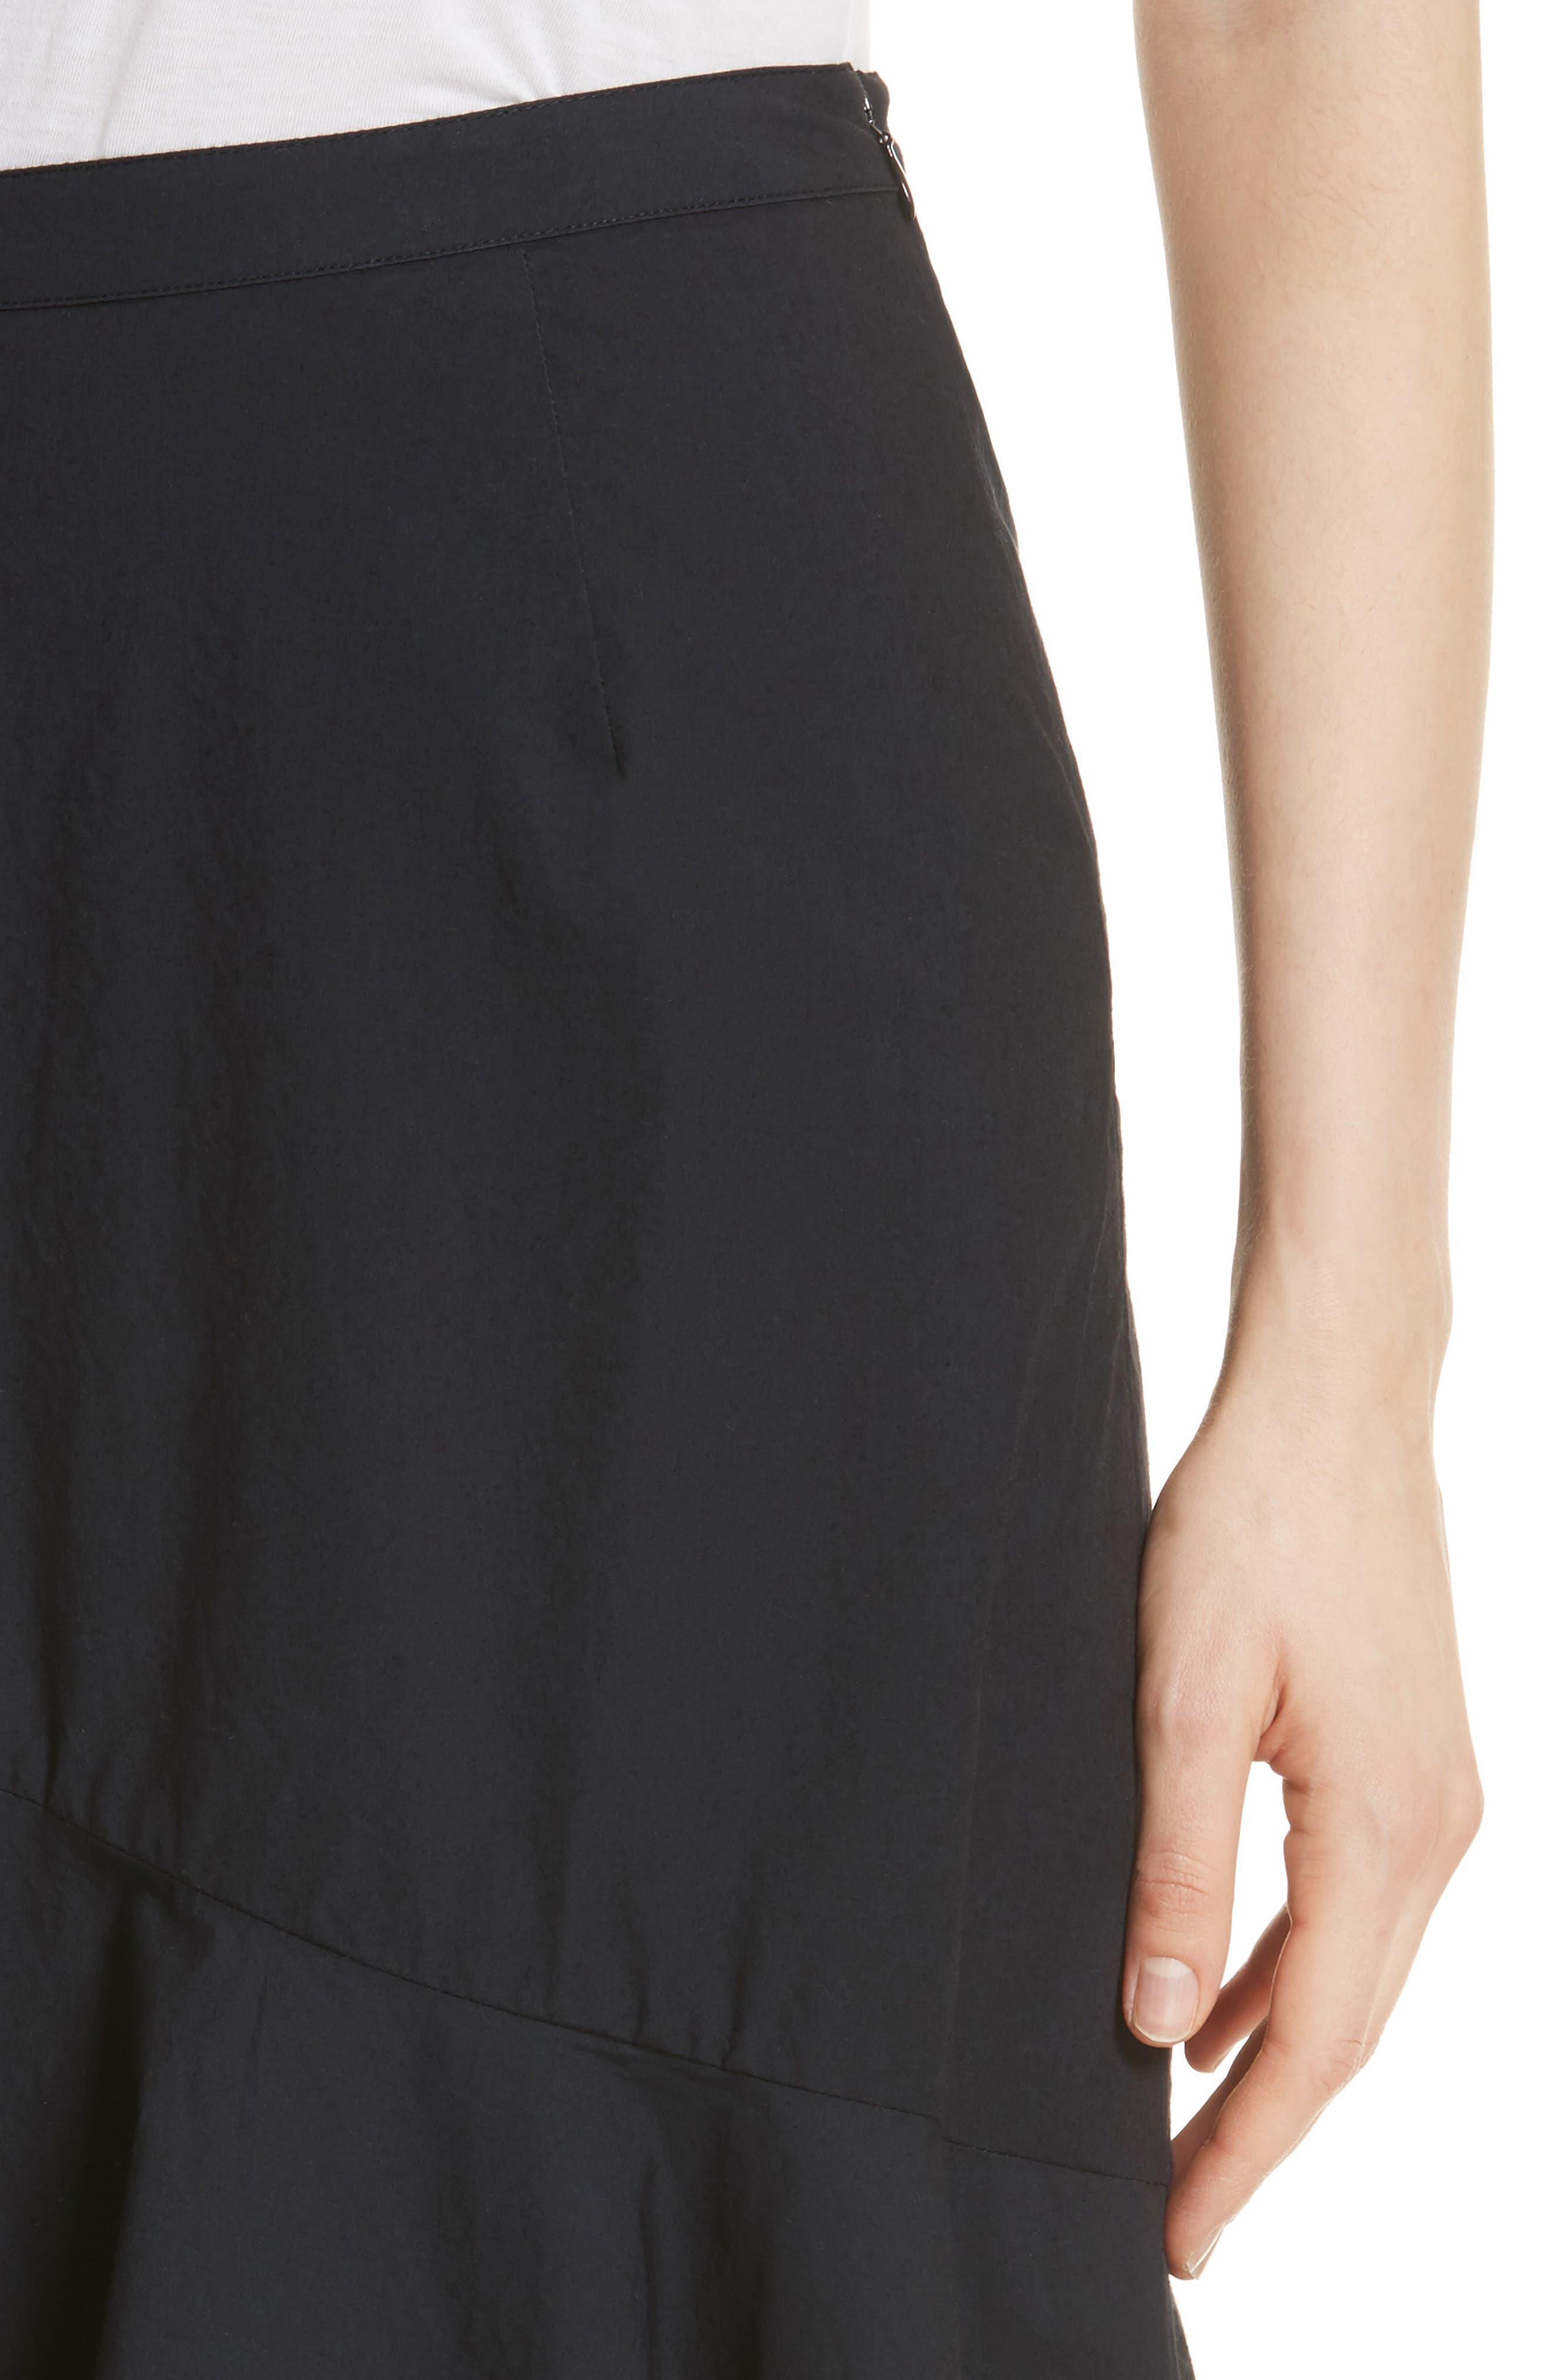 Chesmu Ruffled Cotton Skirt,                             Alternate thumbnail 4, color,                             001